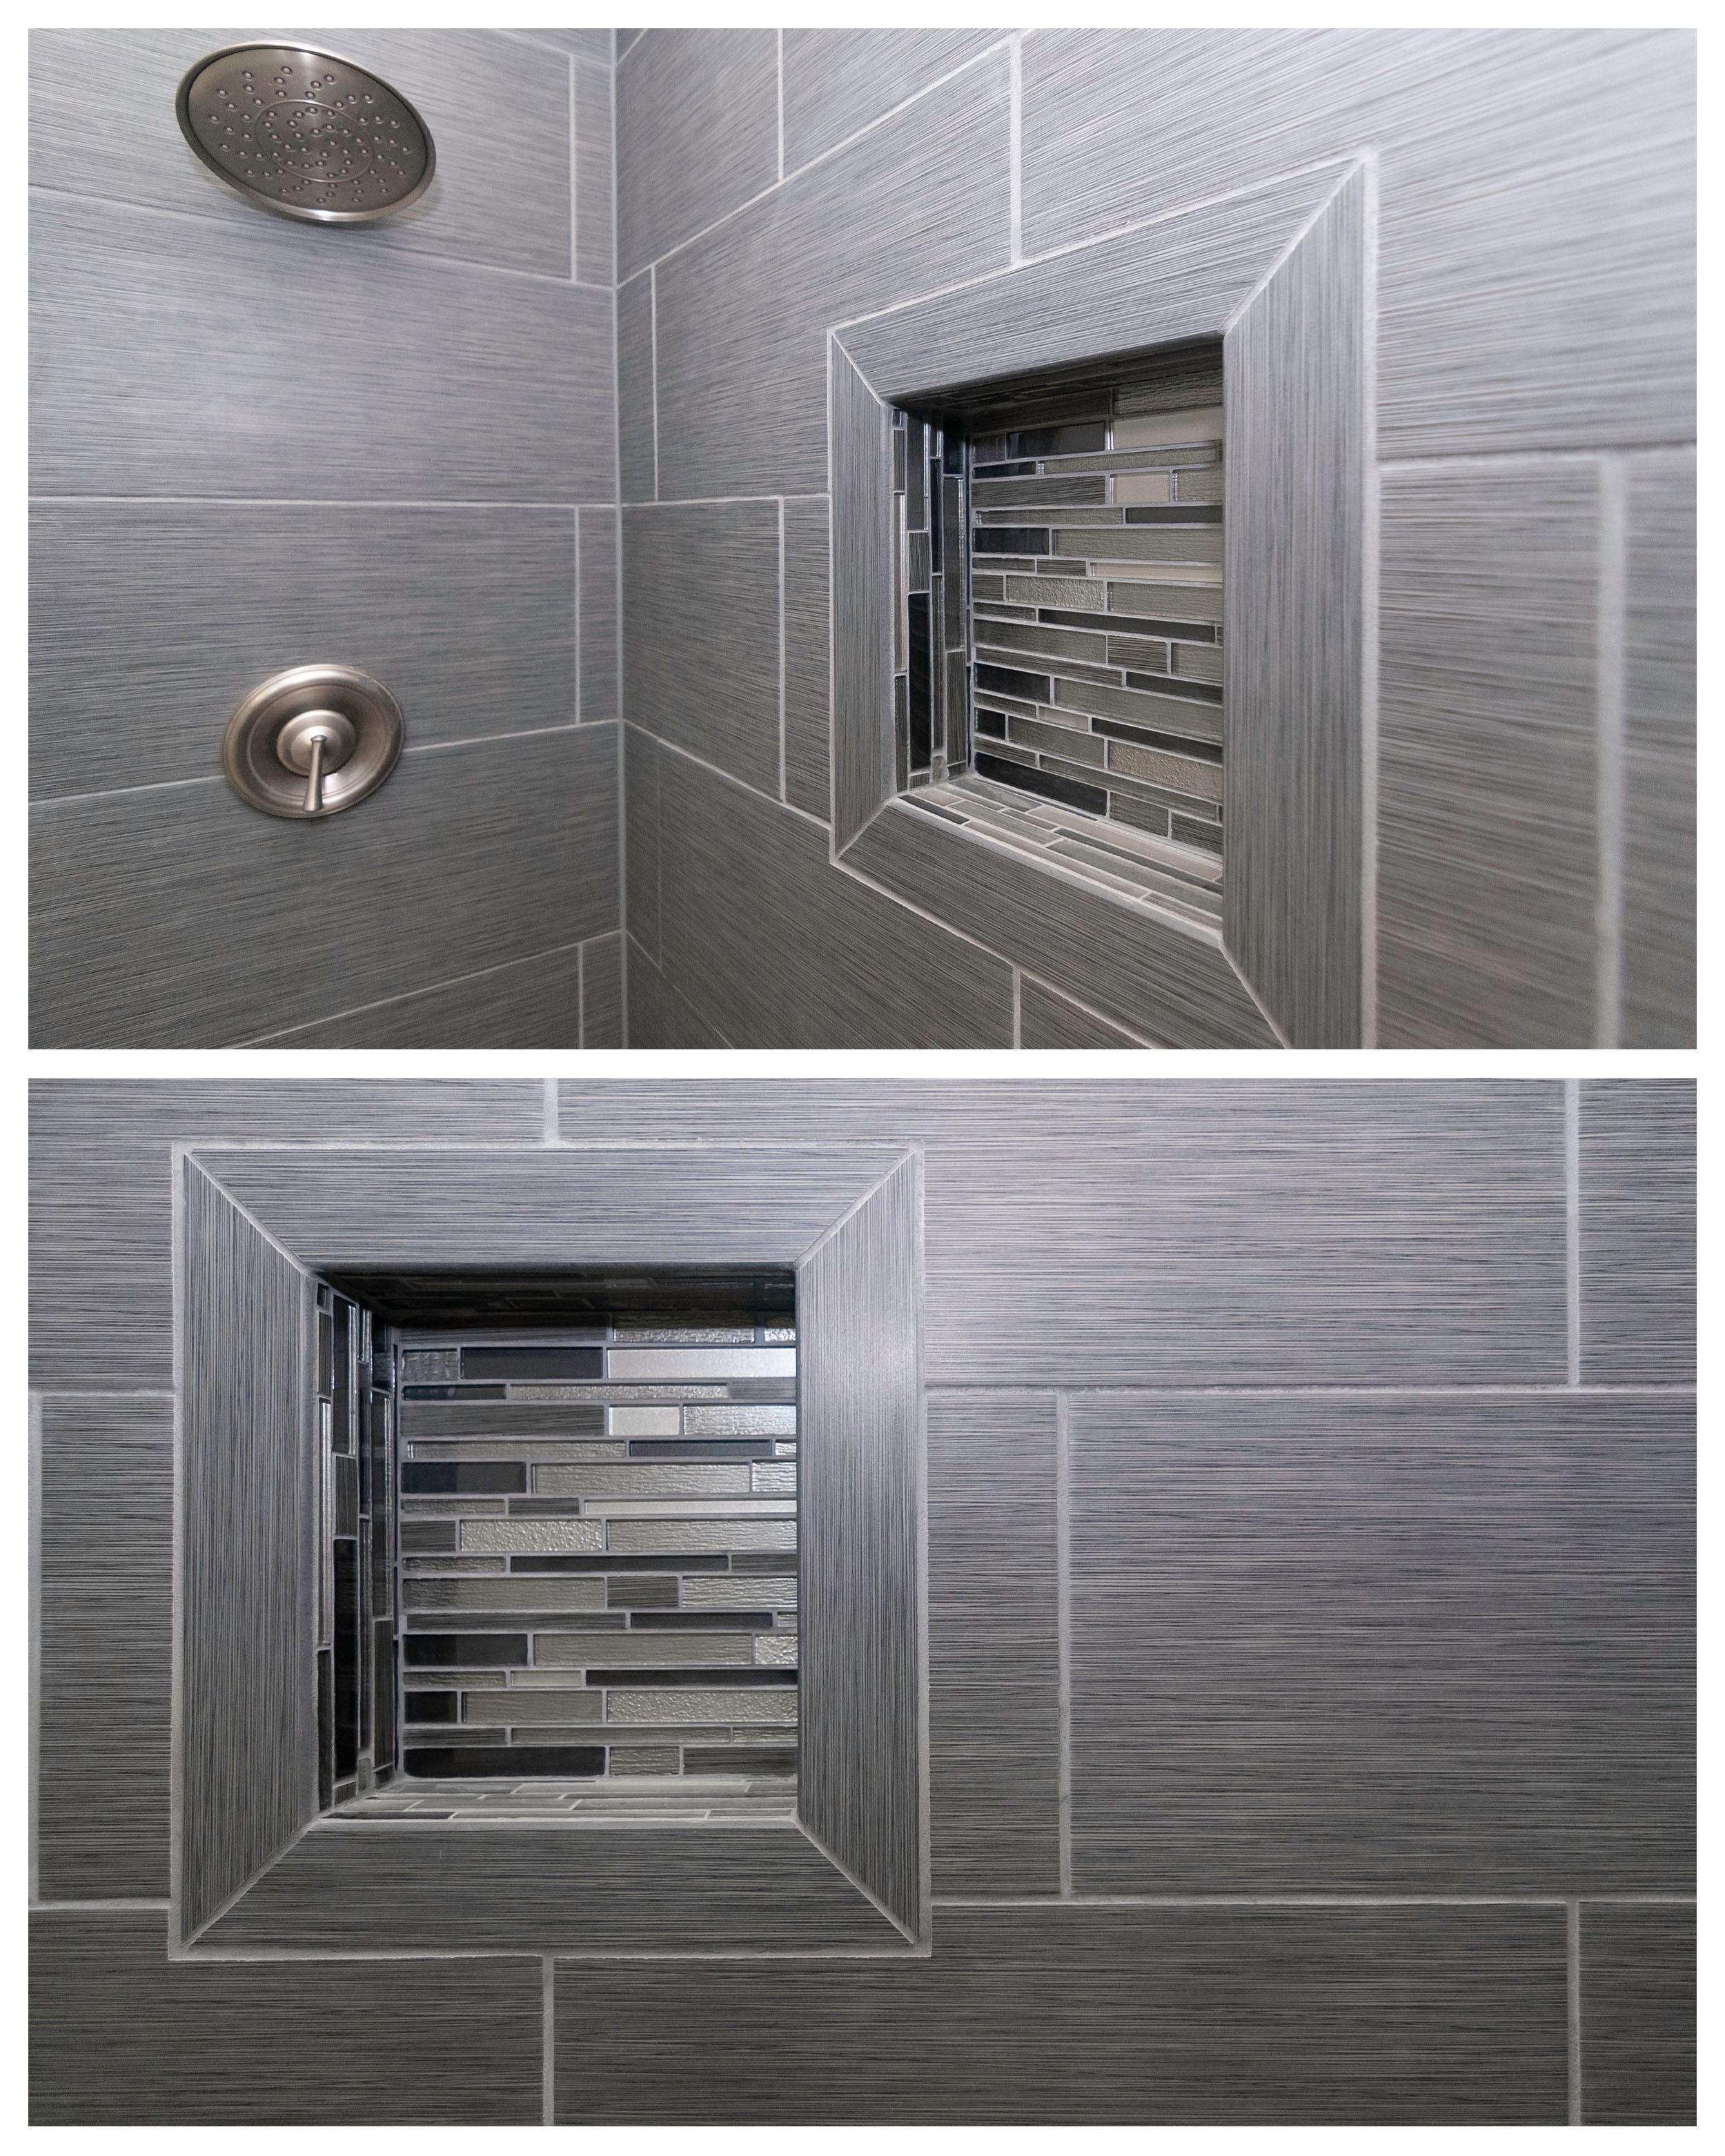 6 Harness Shower Tile Comparison.jpg